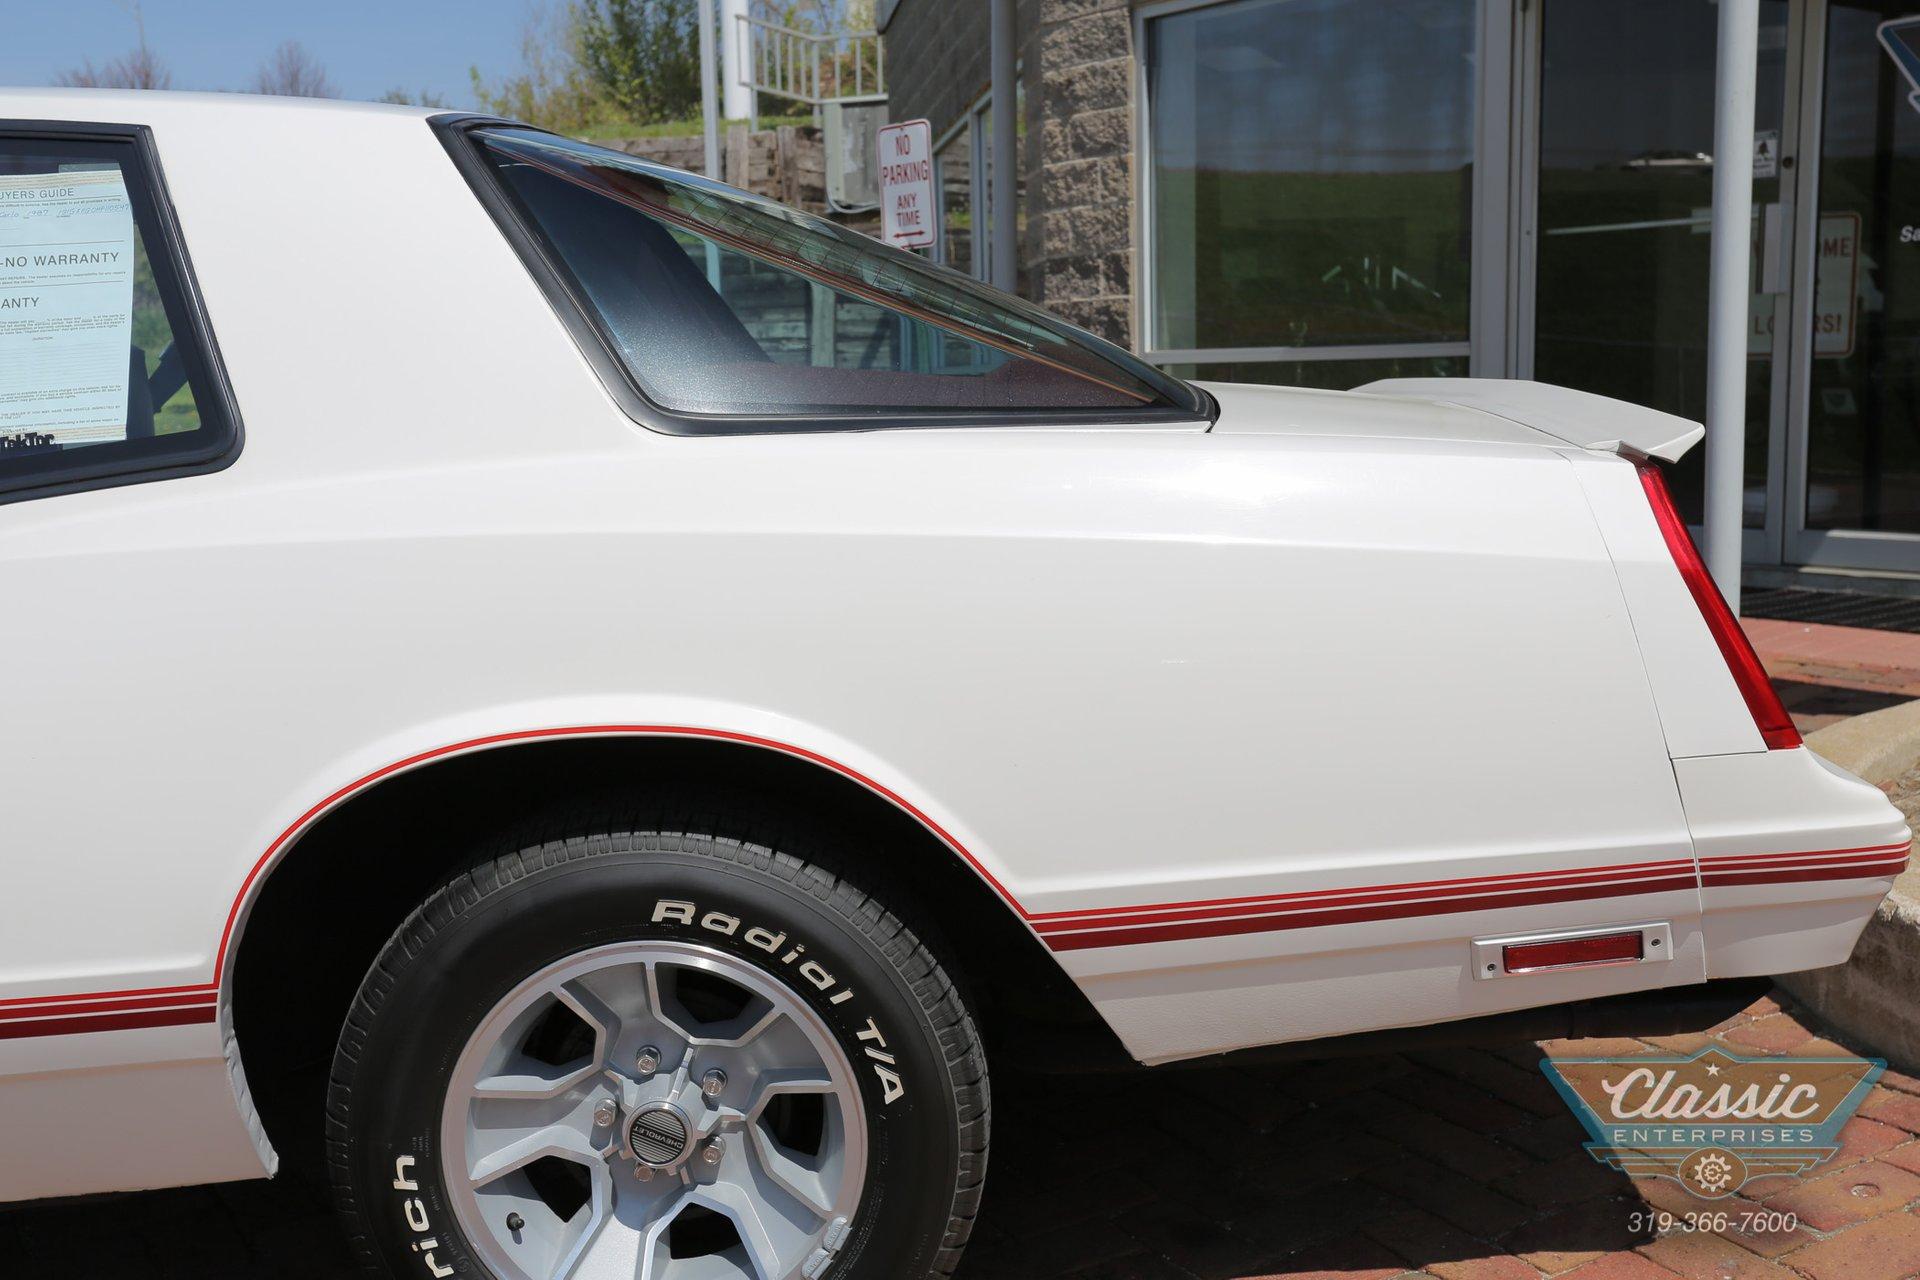 1987 Chevrolet Monte Carlo | Duffy's Classic Cars